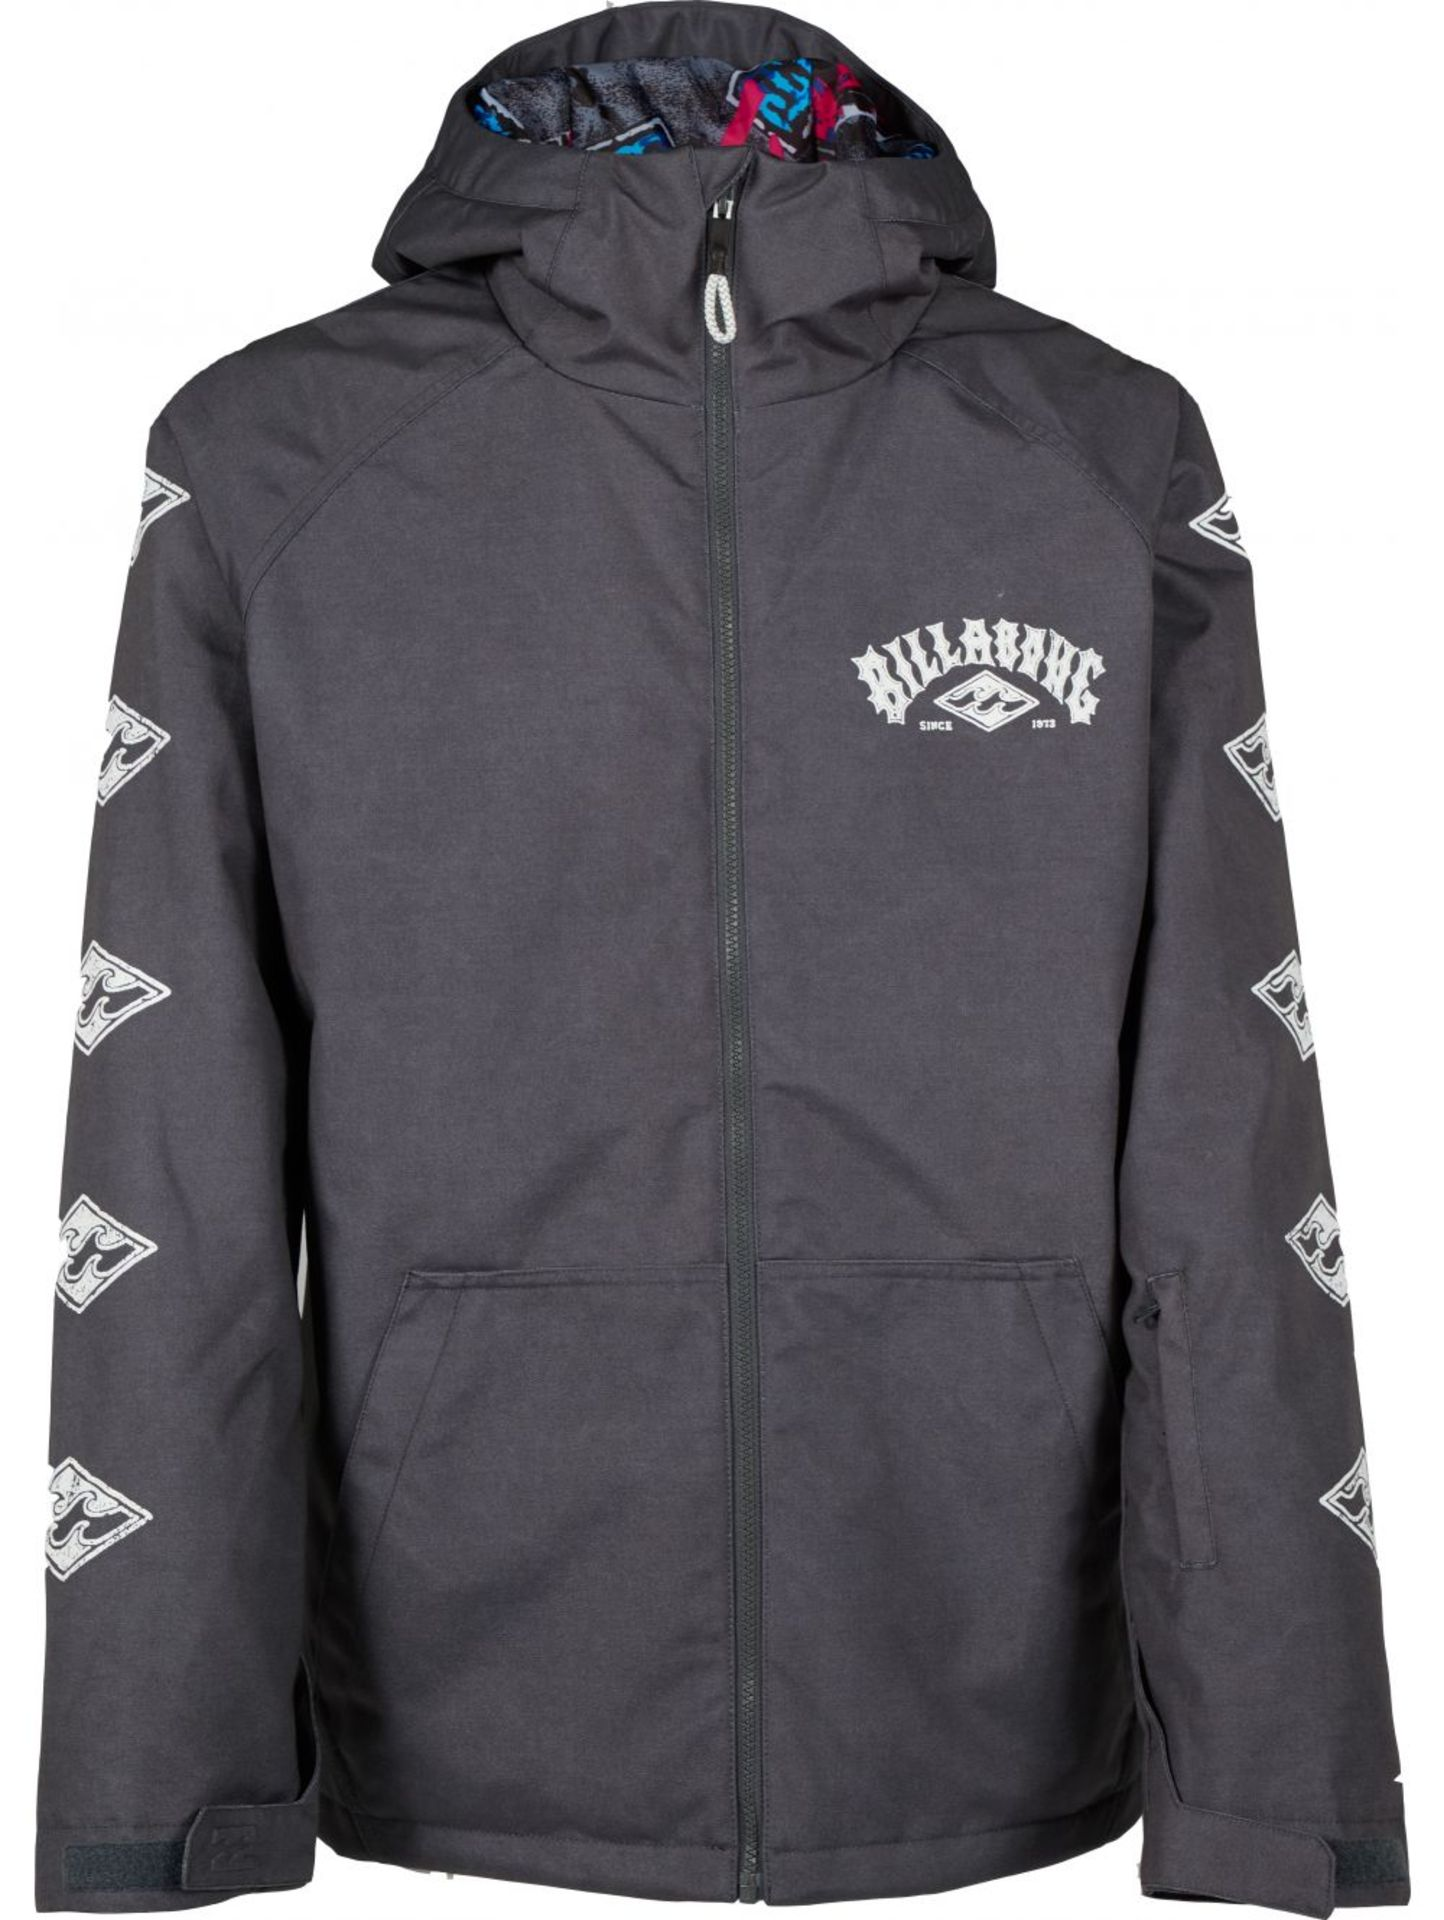 Brand New Billabong All Day Asphalt Jacket - Small